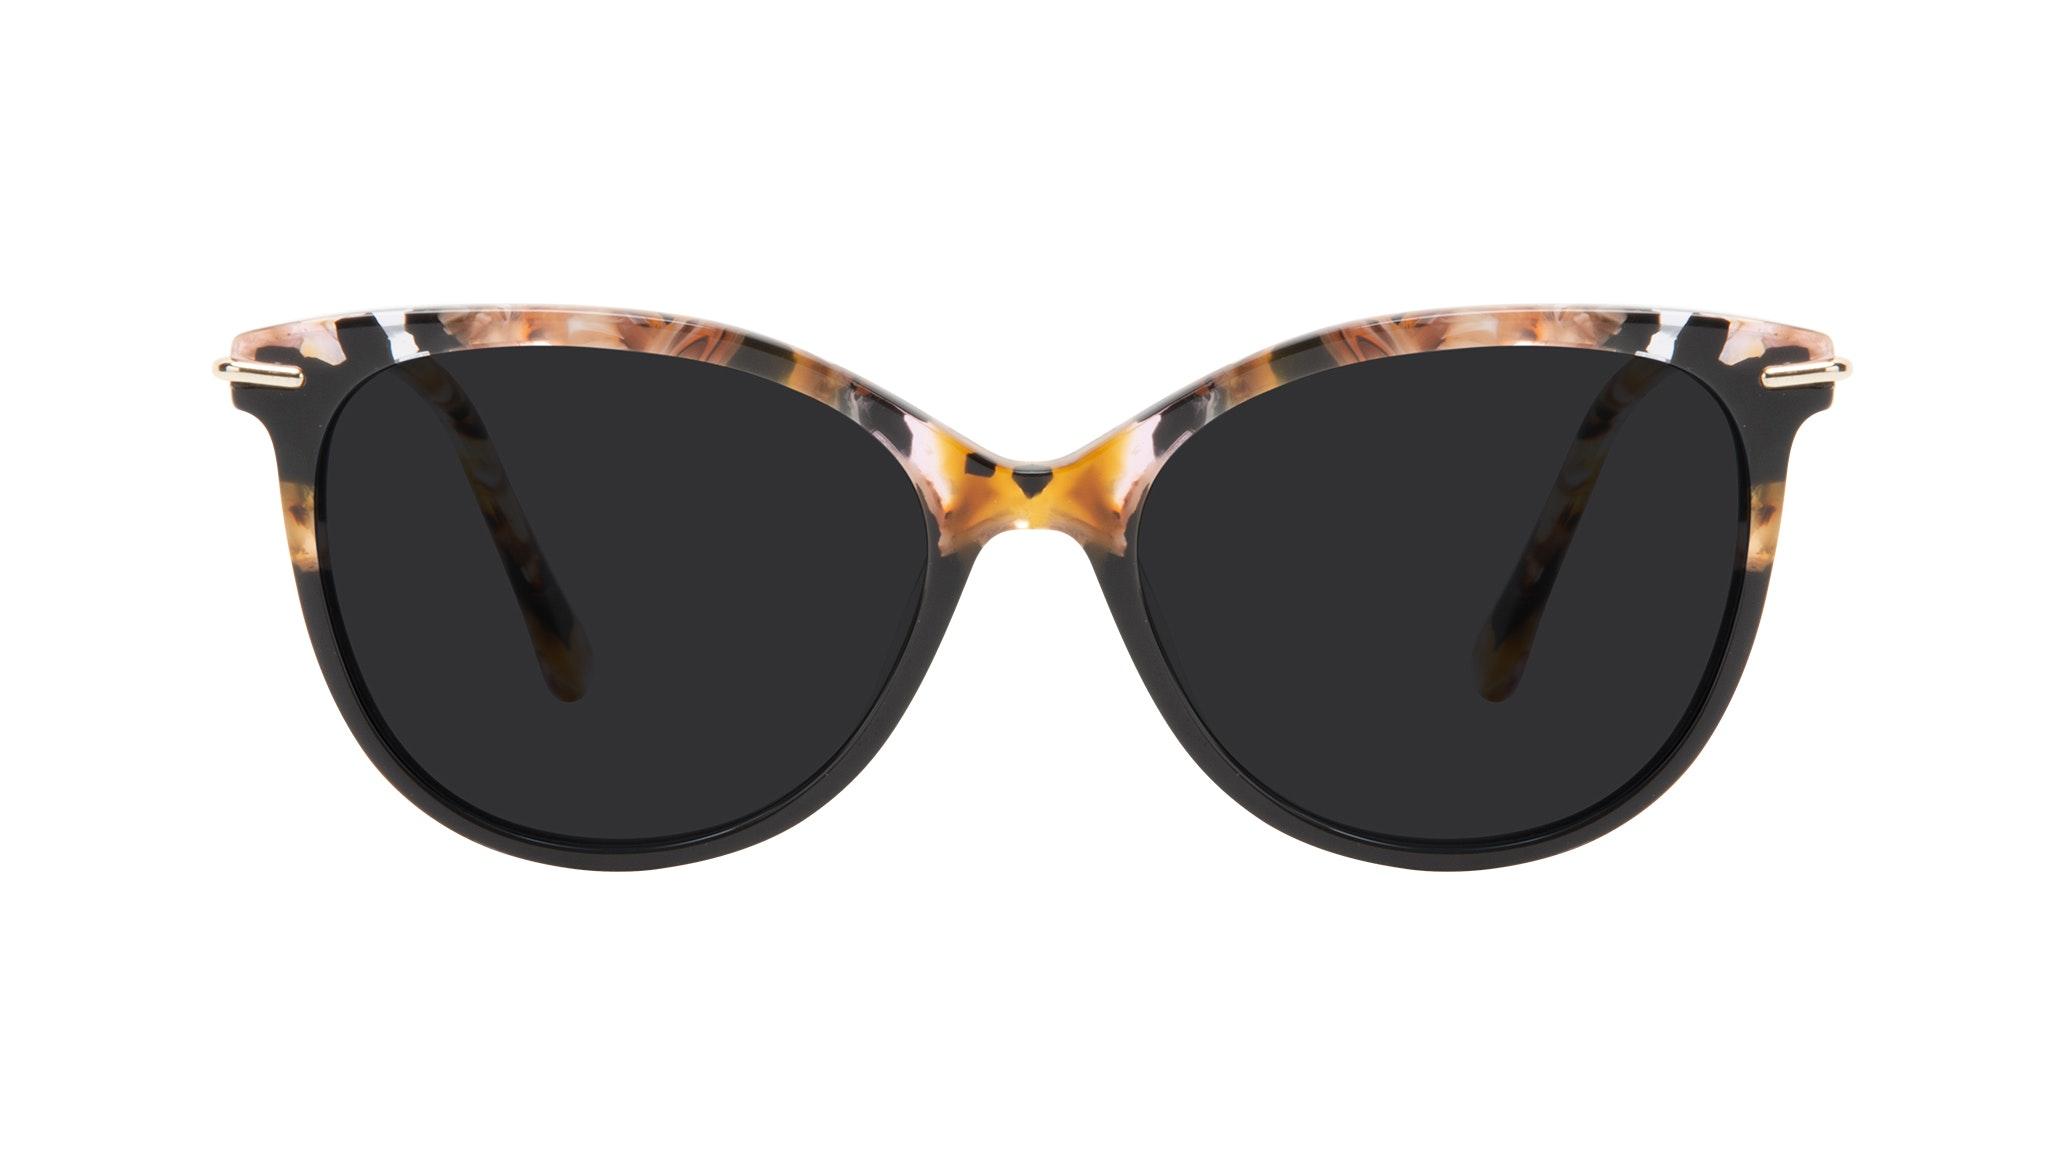 Affordable Fashion Glasses Round Sunglasses Women Sublime Black Flake Front